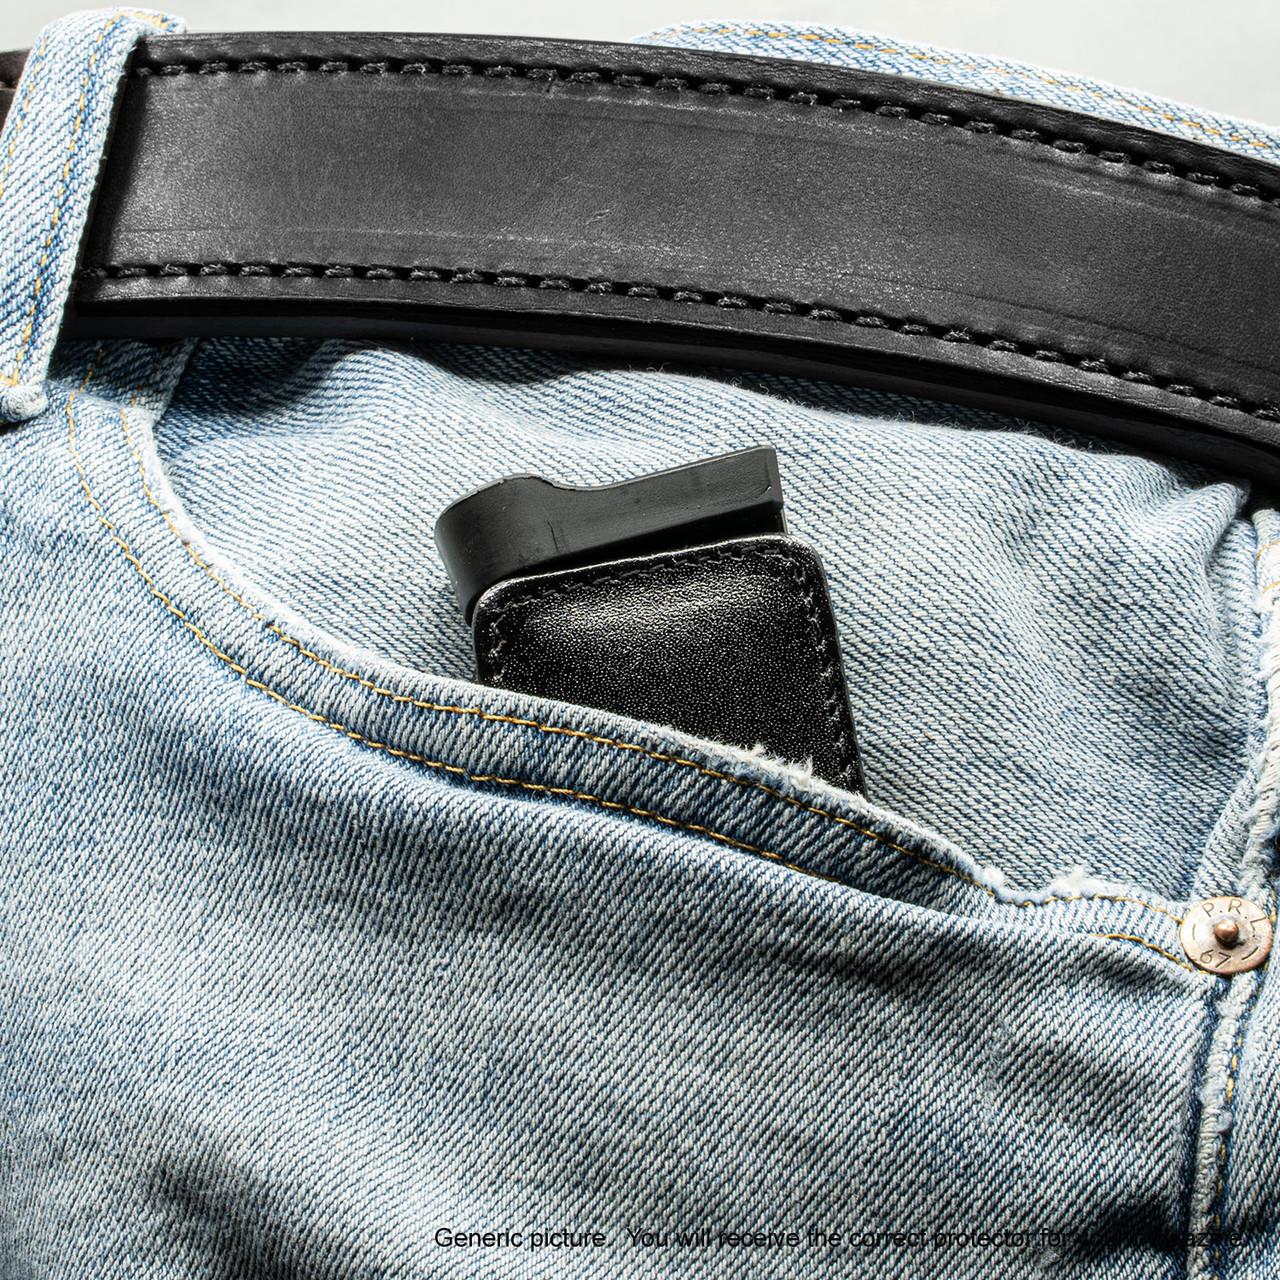 Mossberg MC2c Black Leather Magazine Pocket Protector